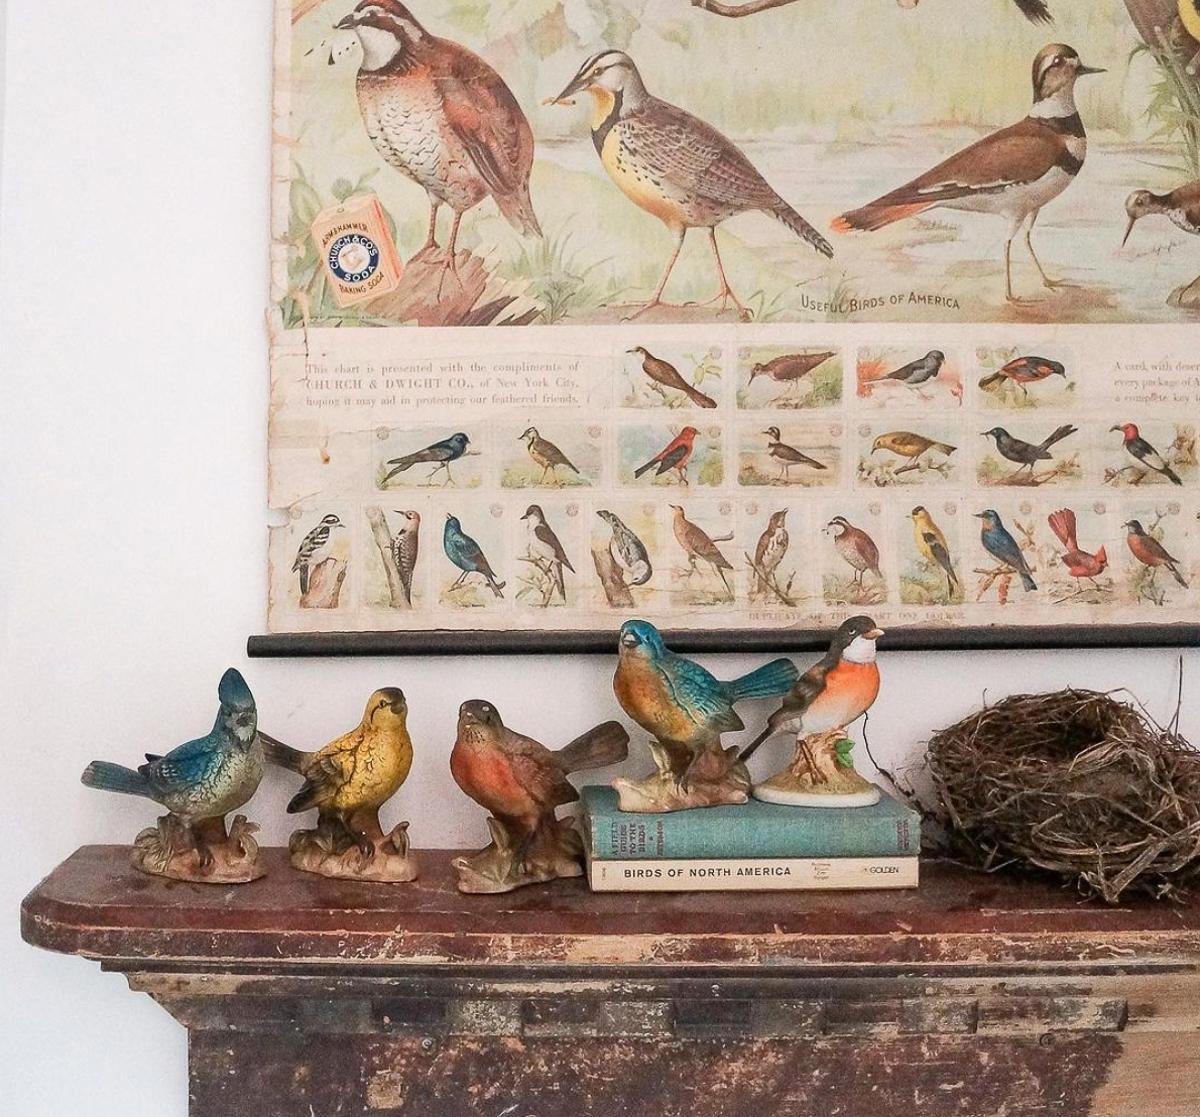 Vintage bird figurine collection kellyelko.com